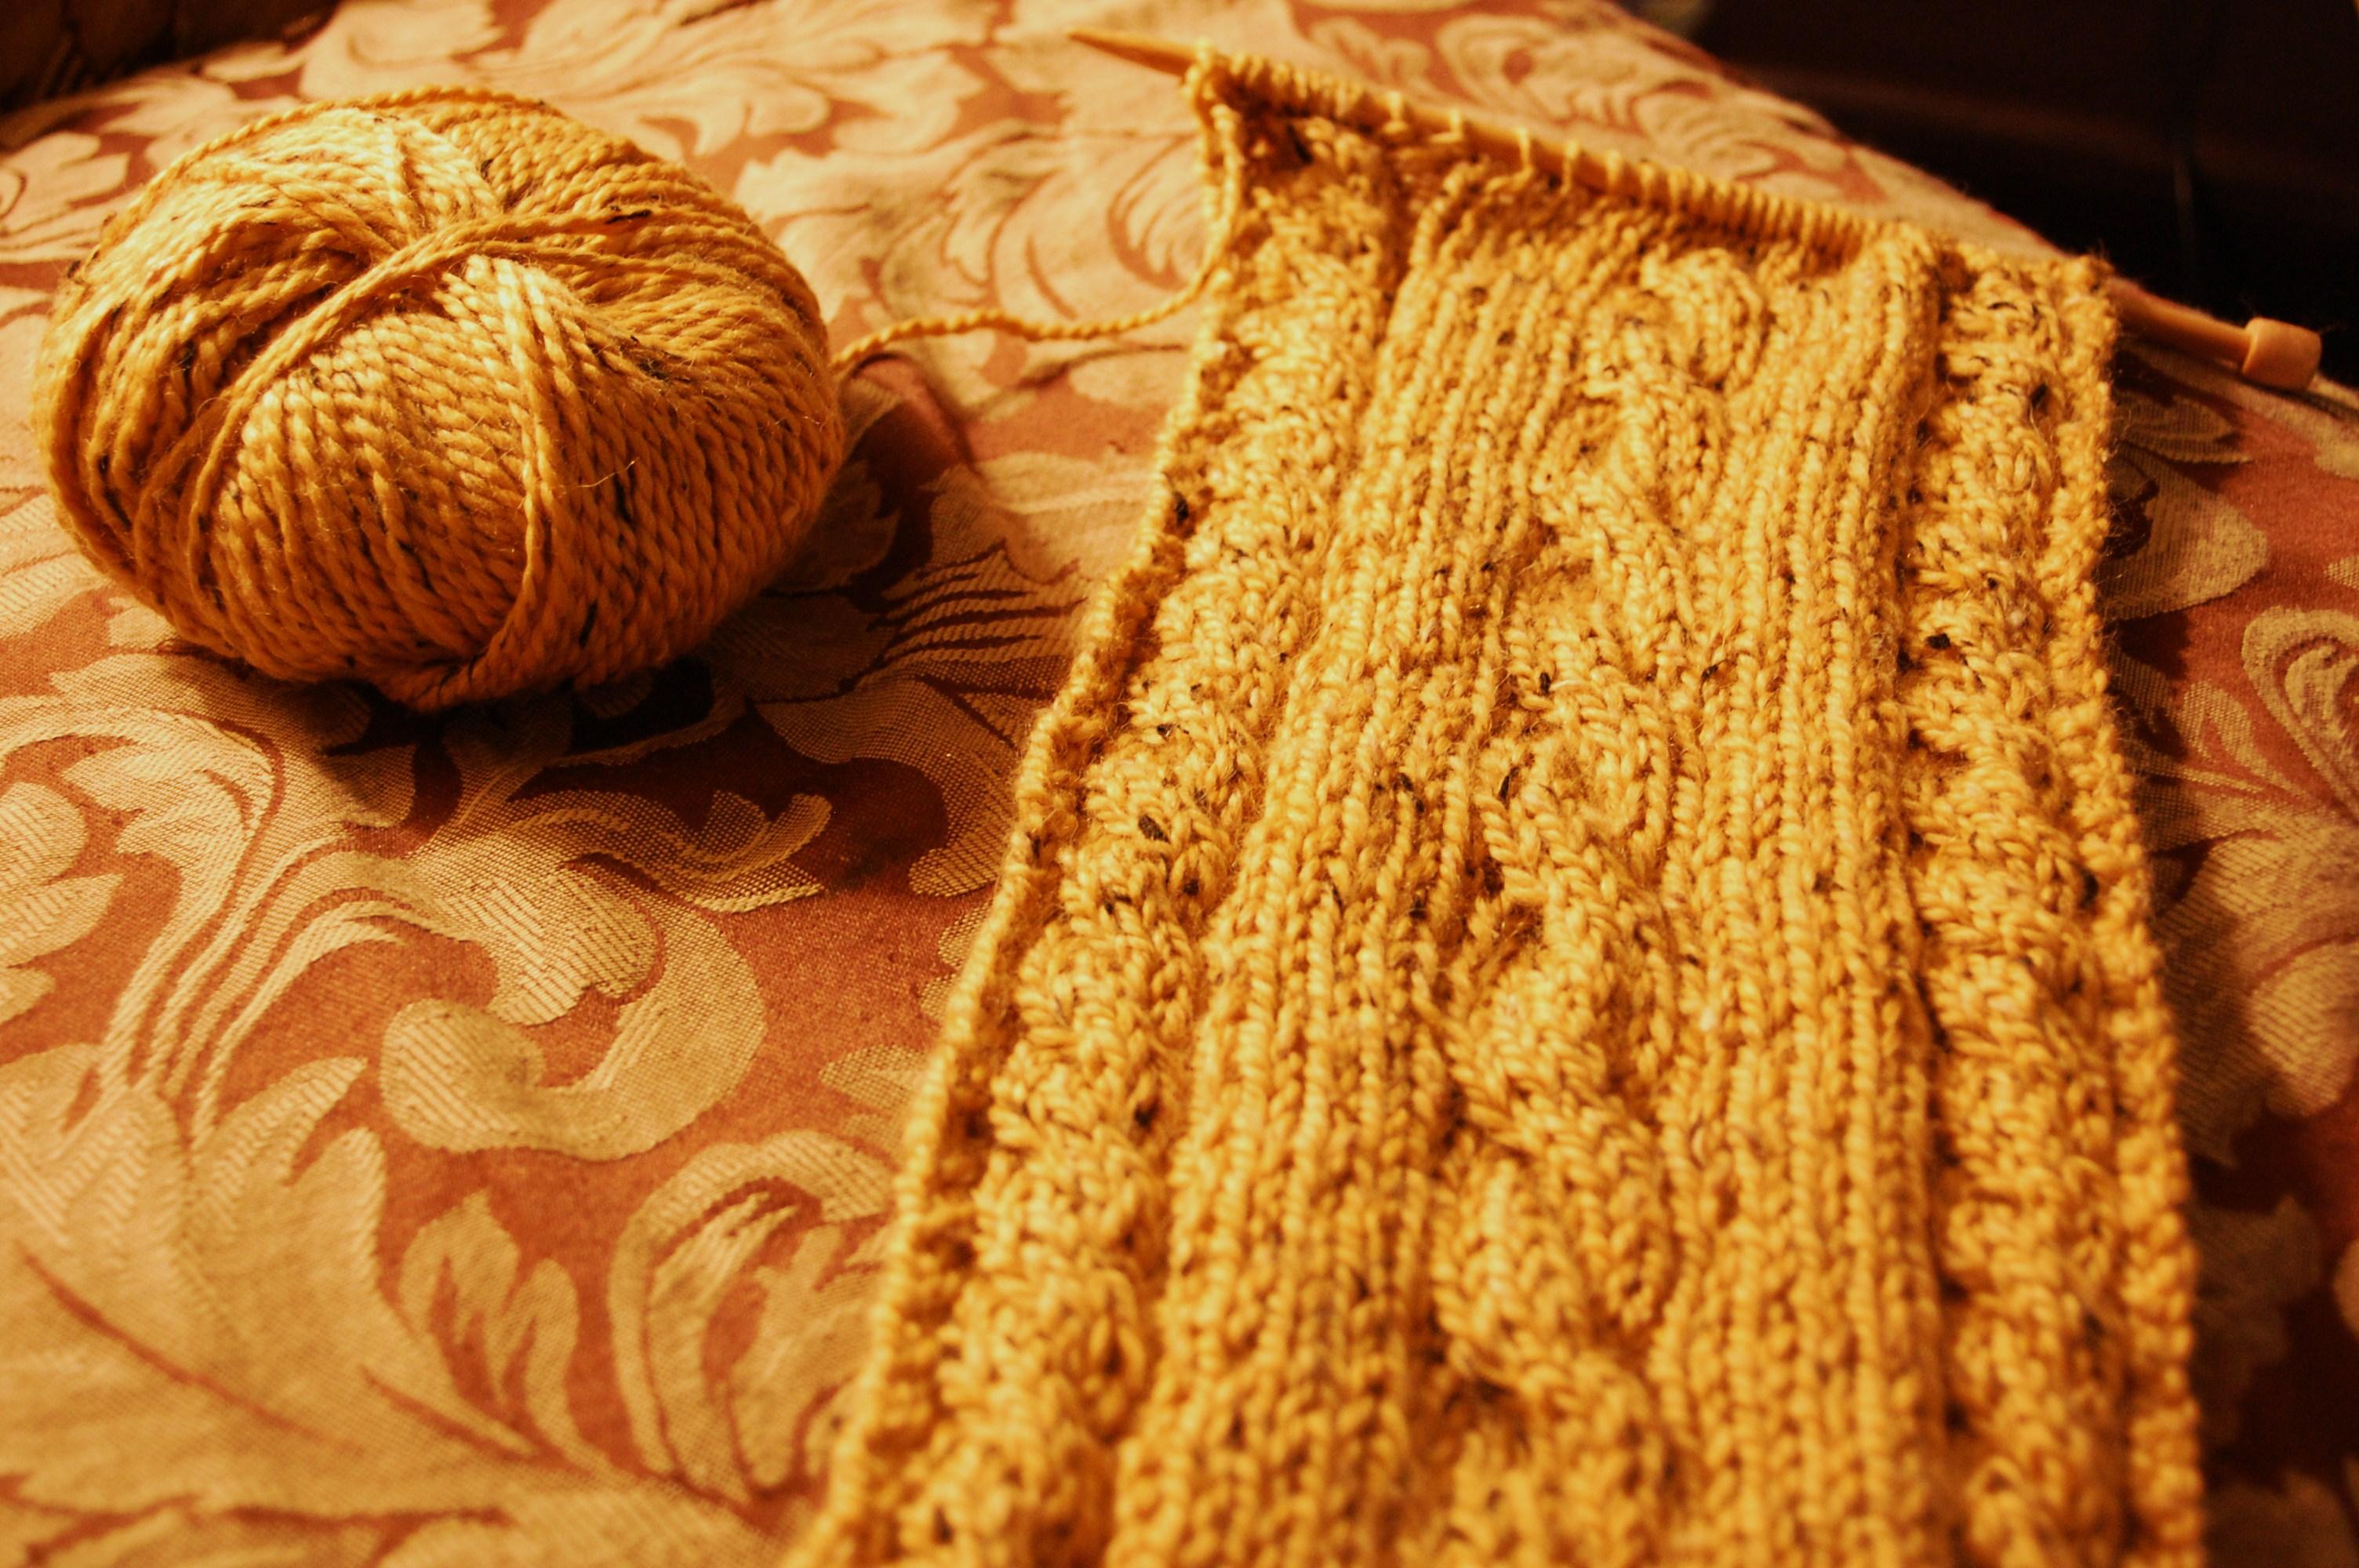 Knit Picky Patterns From Allfreeknitting : Lemon Curd Scarf Knittybutton